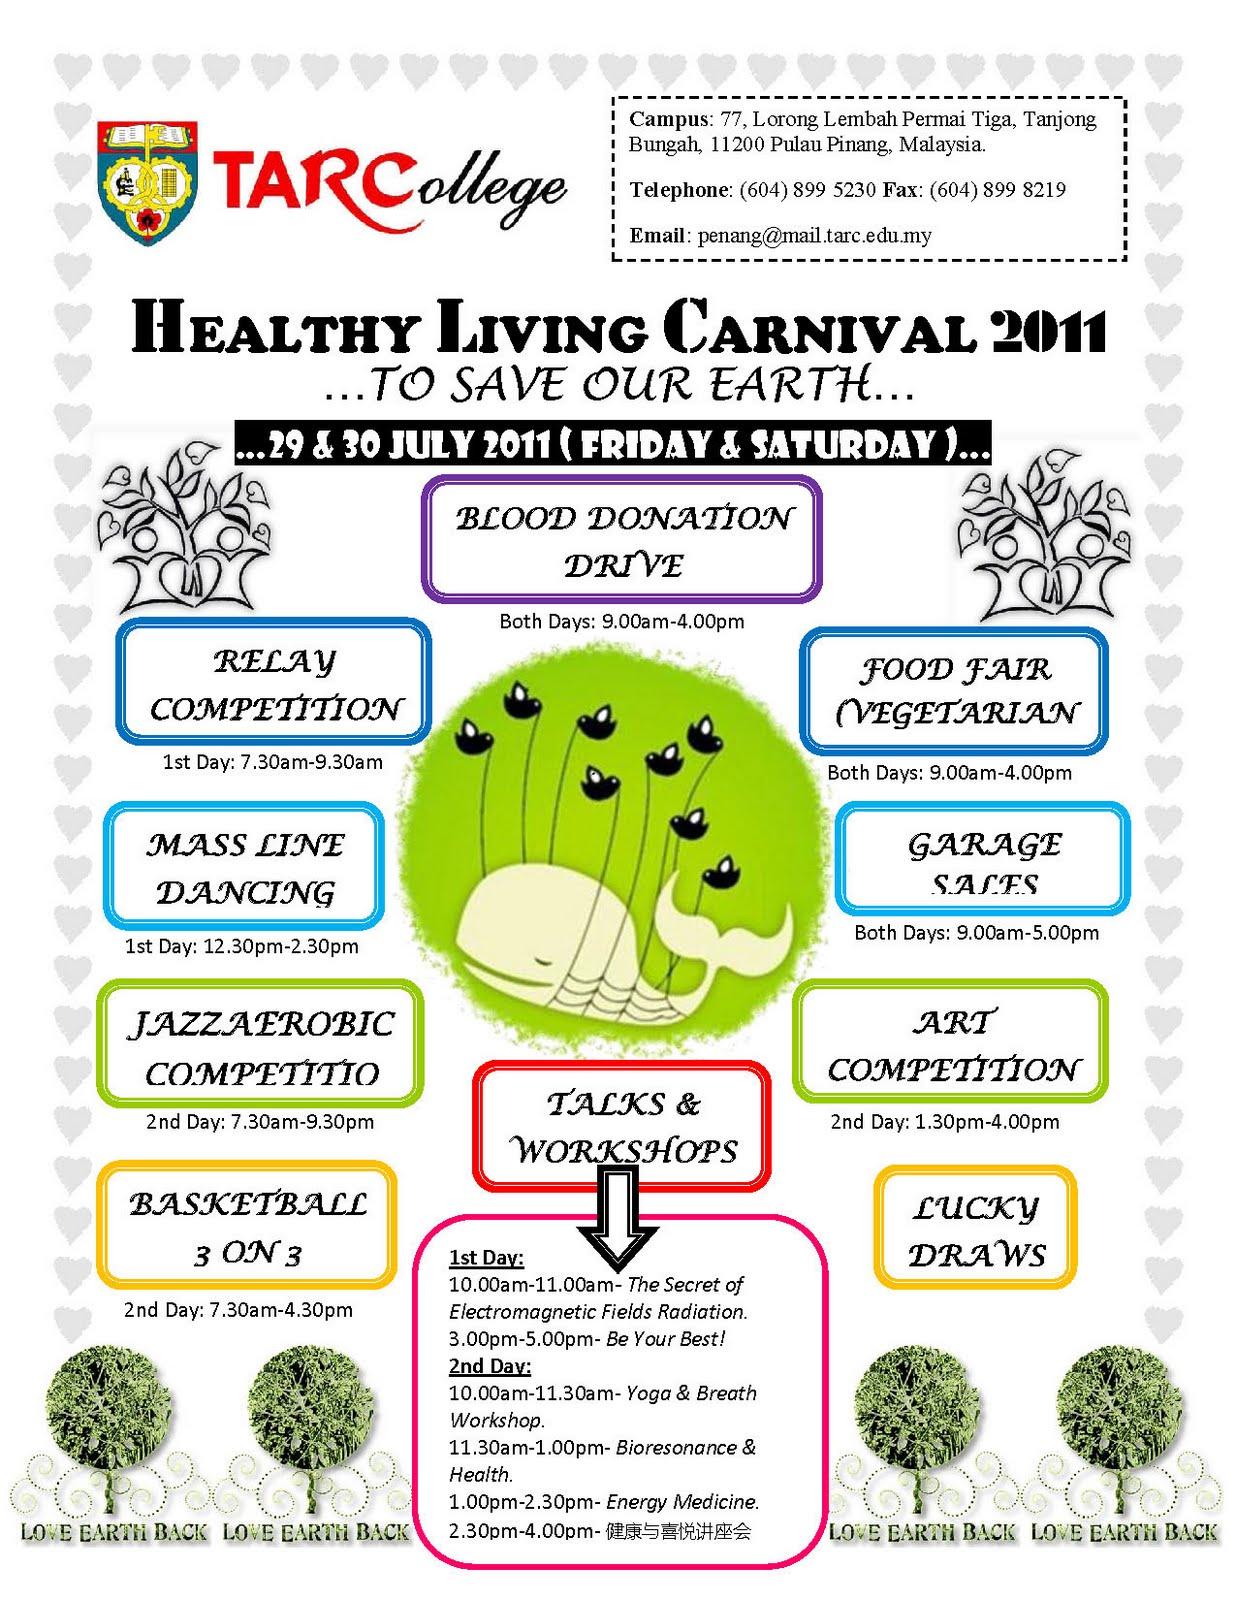 Pencil Box Bookstore Healthy Living Carnival Tar College